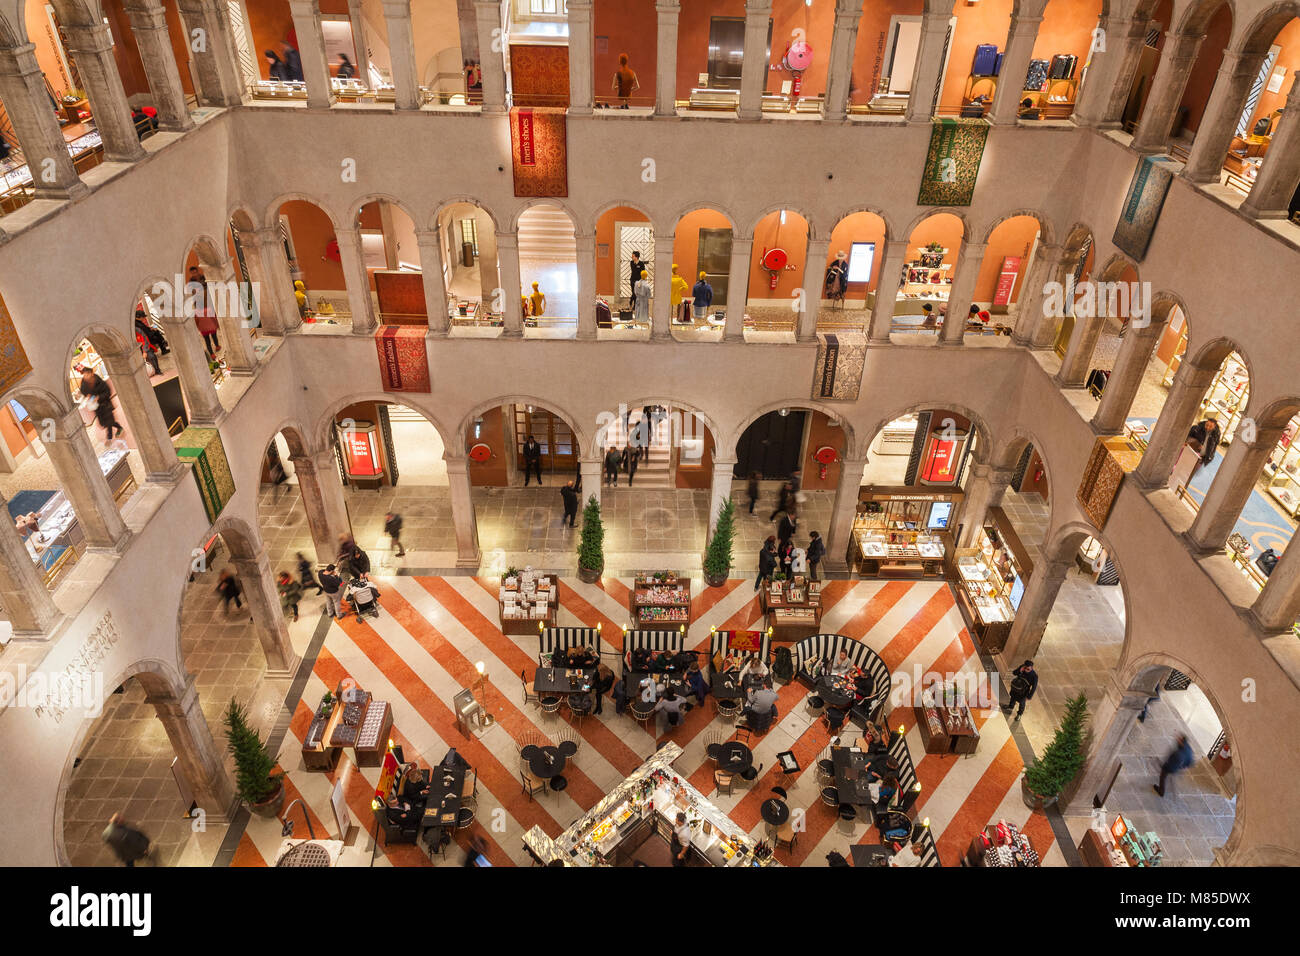 T Fondaco dei Tedeschi interior, San Marco, Venecia, Véneto, Italia. Esta tienda de lujo está situado Imagen De Stock